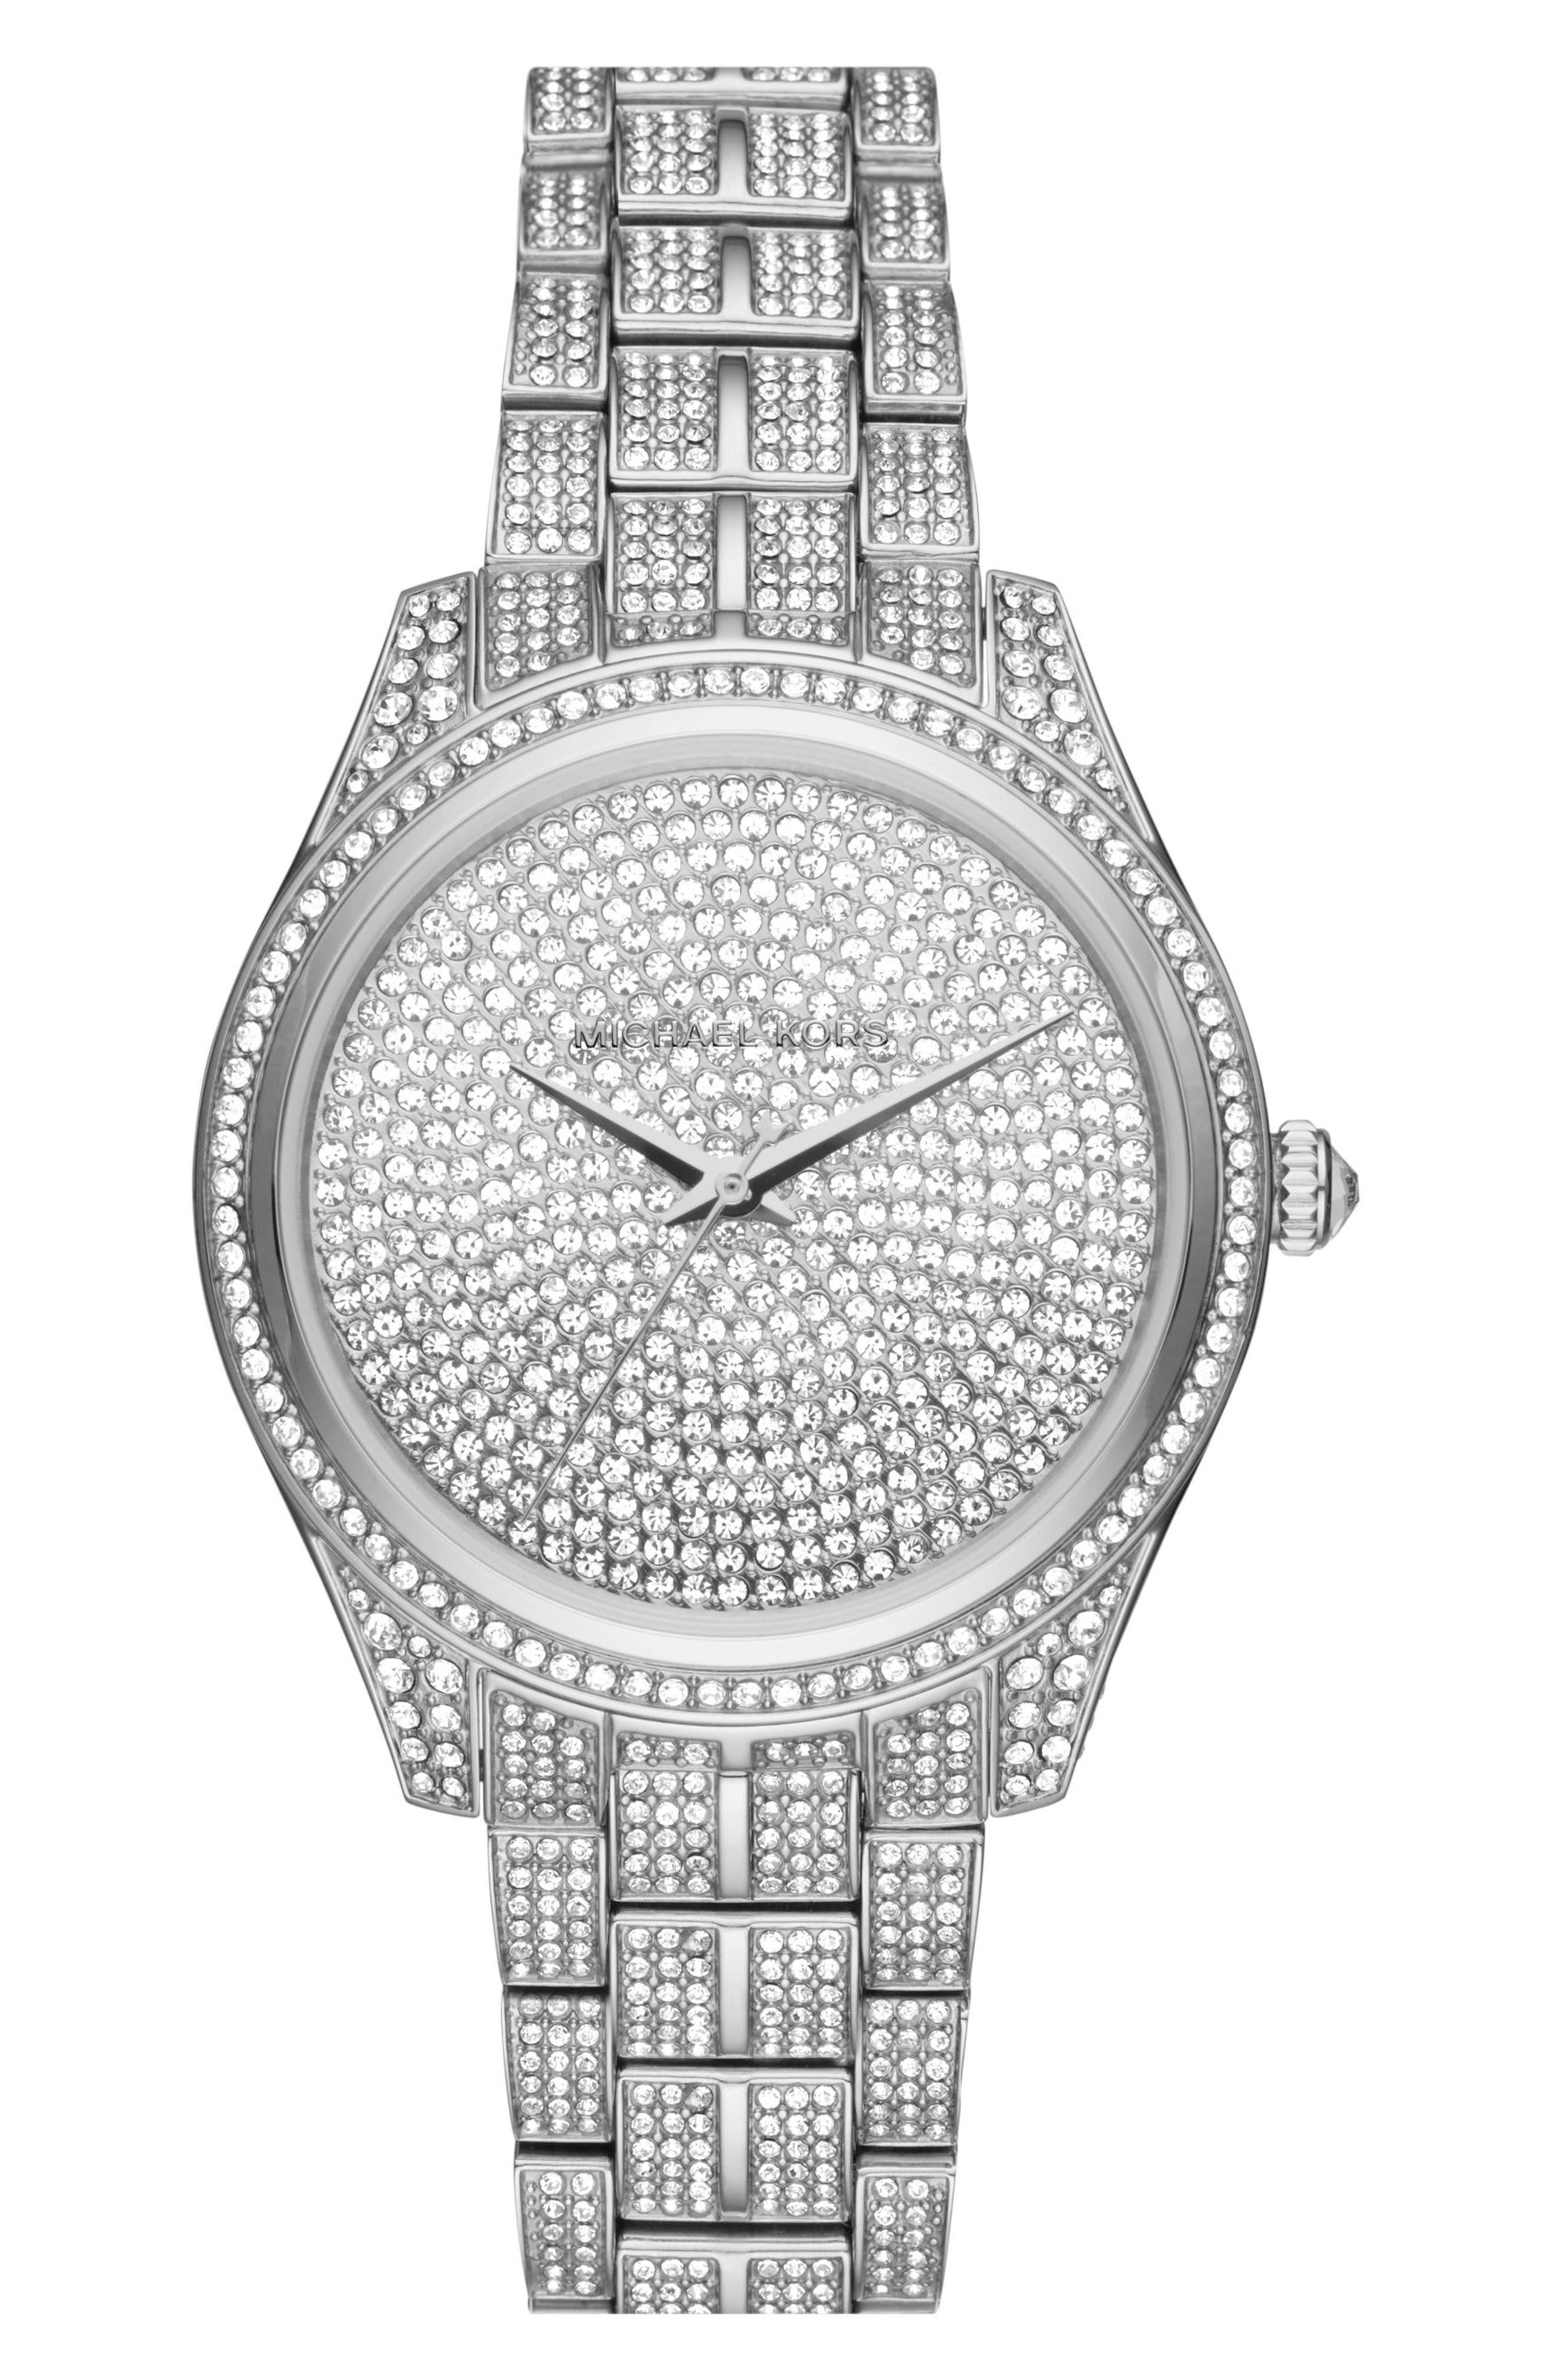 Main Image - Michael Kors Lauryn Pavé Crystal Bracelet Watch, 38mm